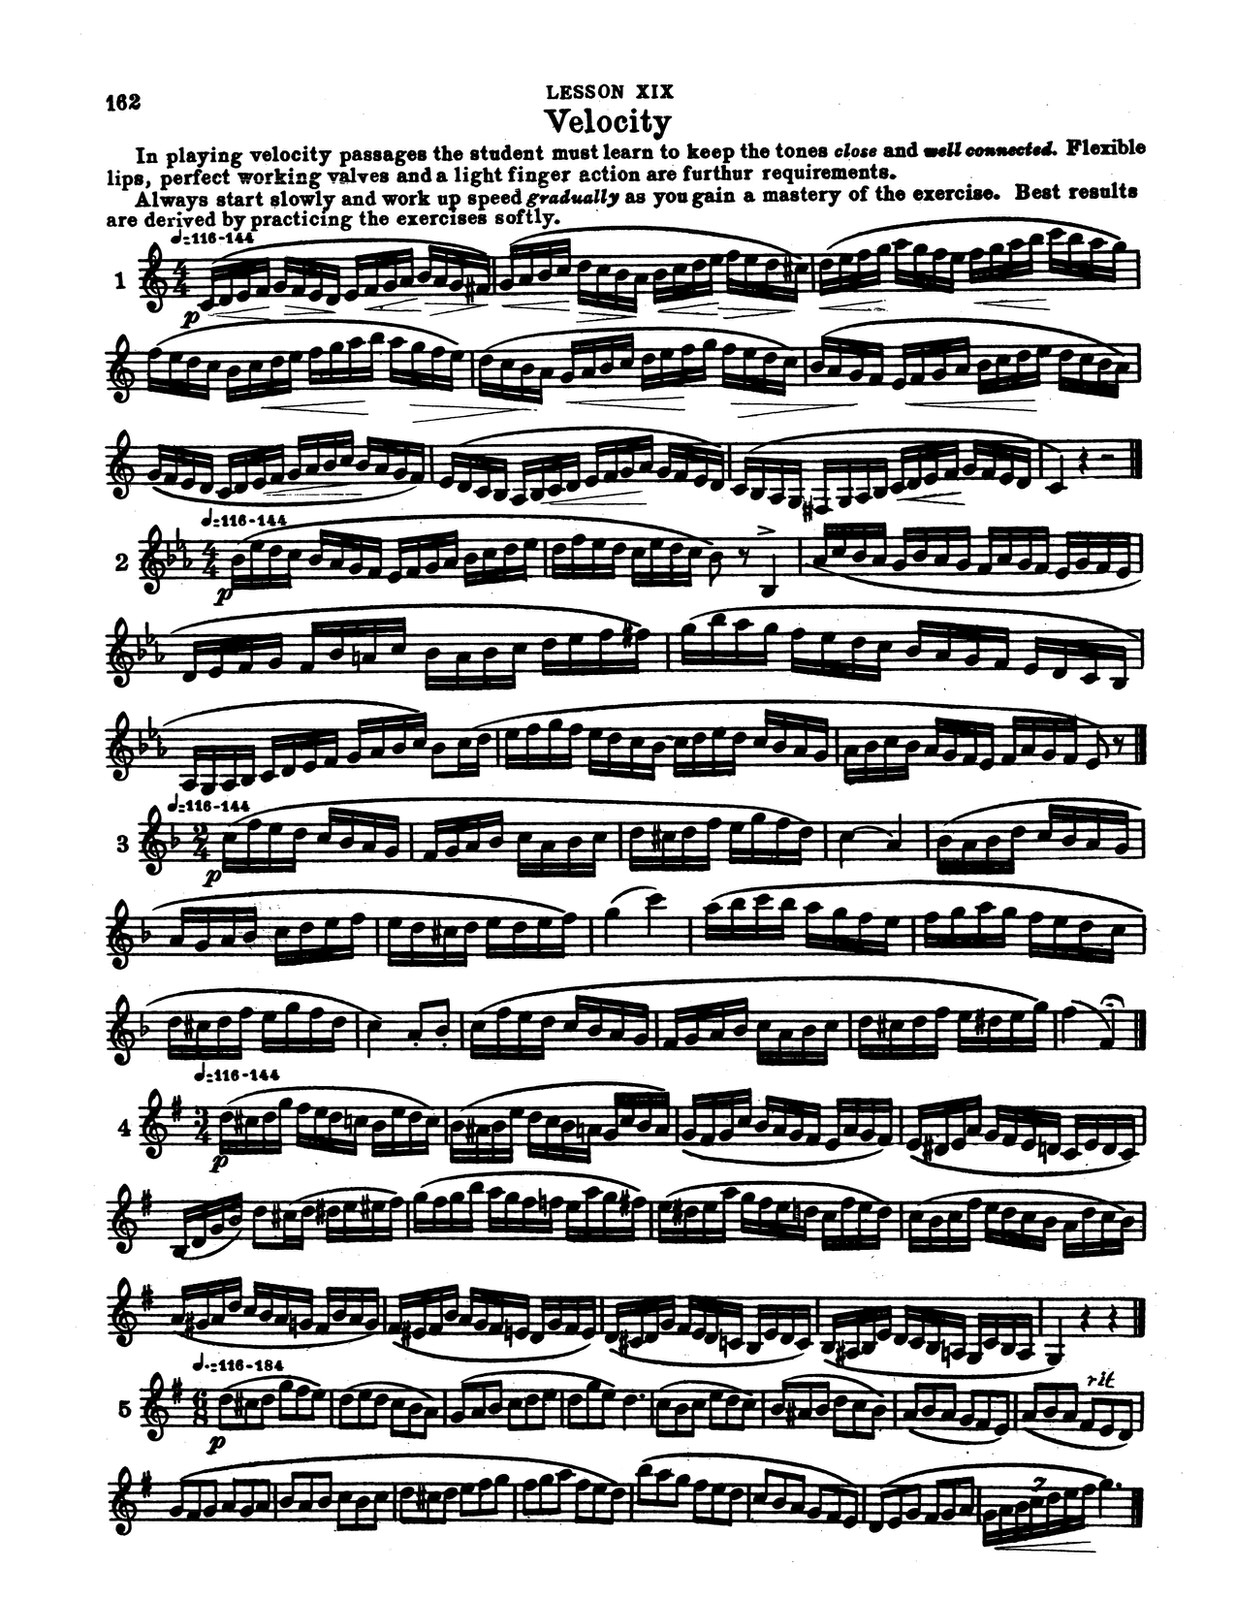 Eby, Walter Scientific Method for Trumpet Volume 3 4